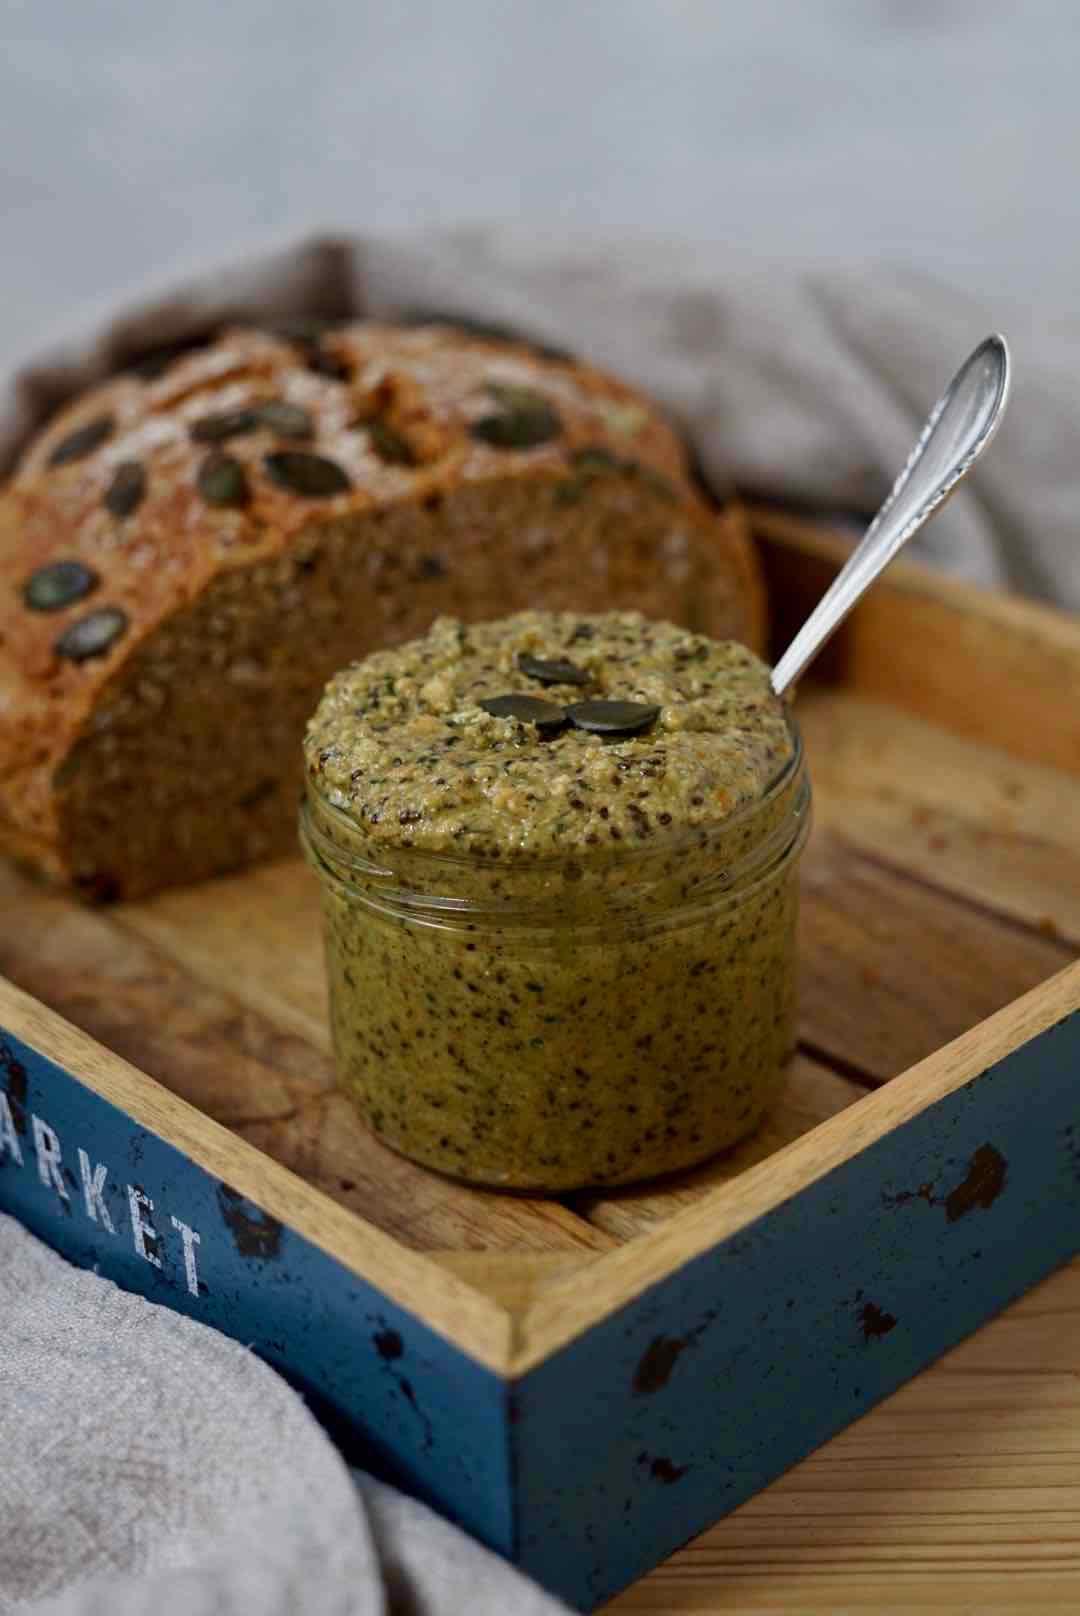 Erdnuss-Kürbis-Crunch